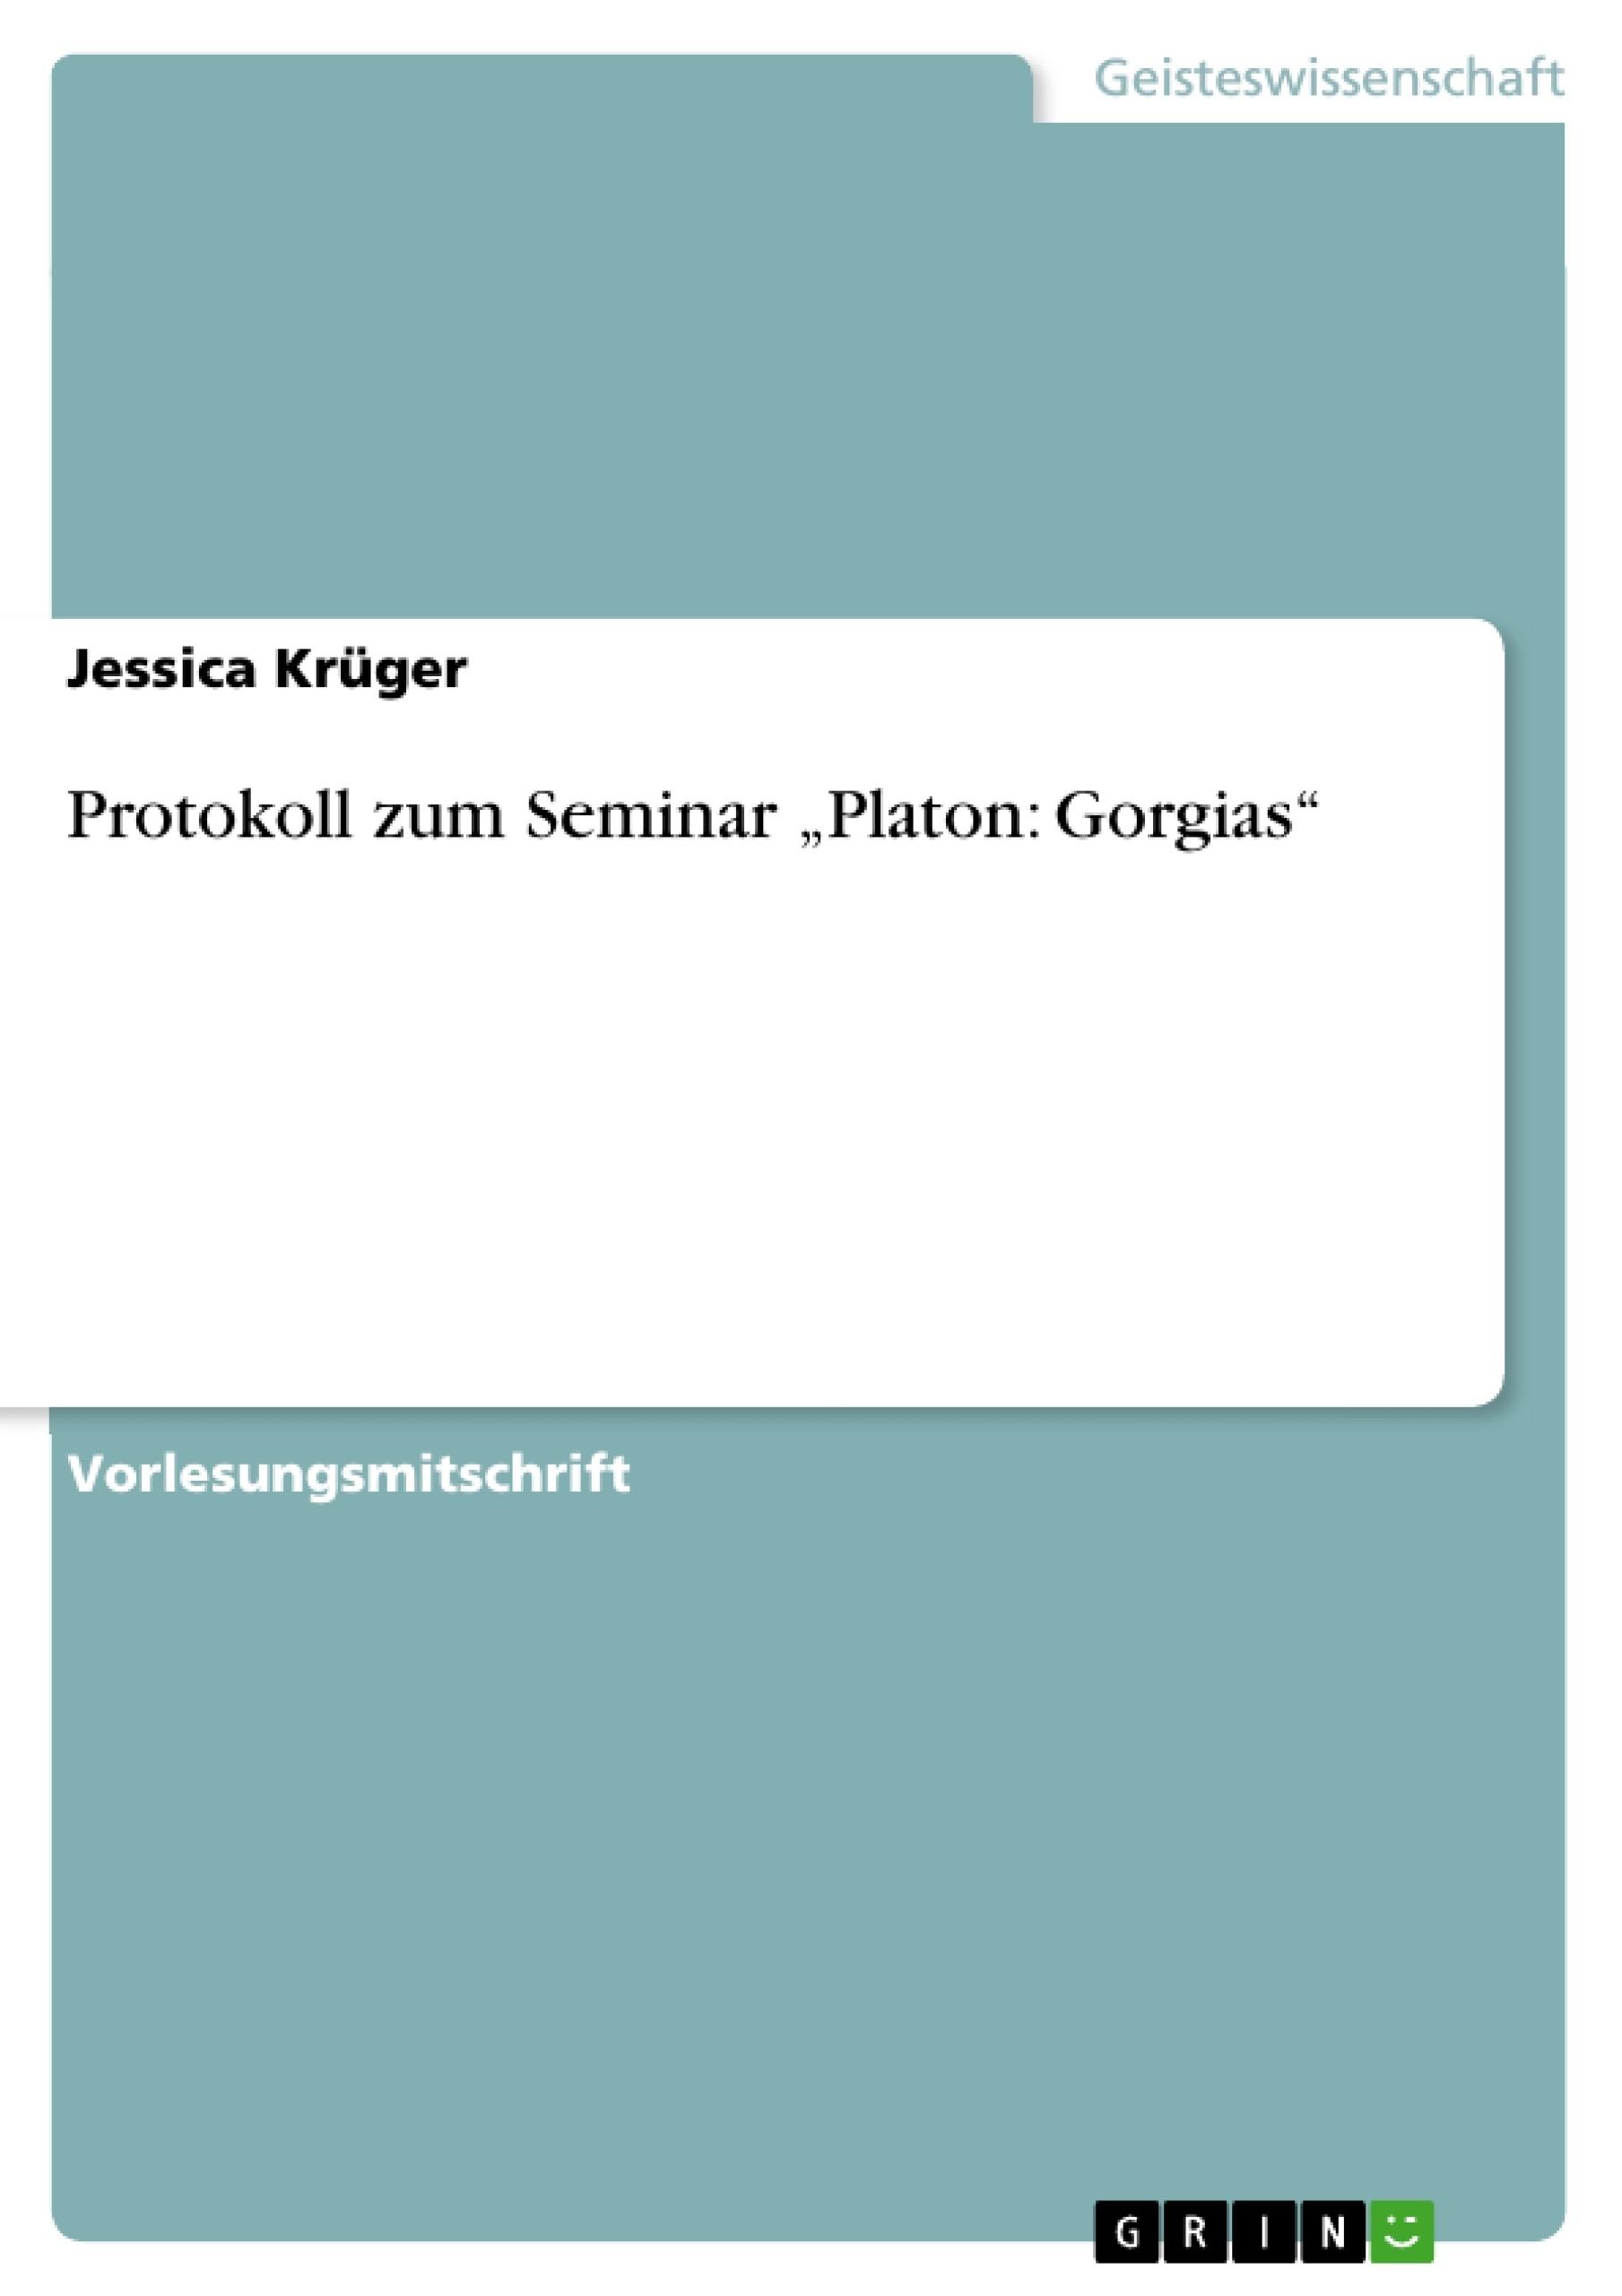 Platon gorgias essay